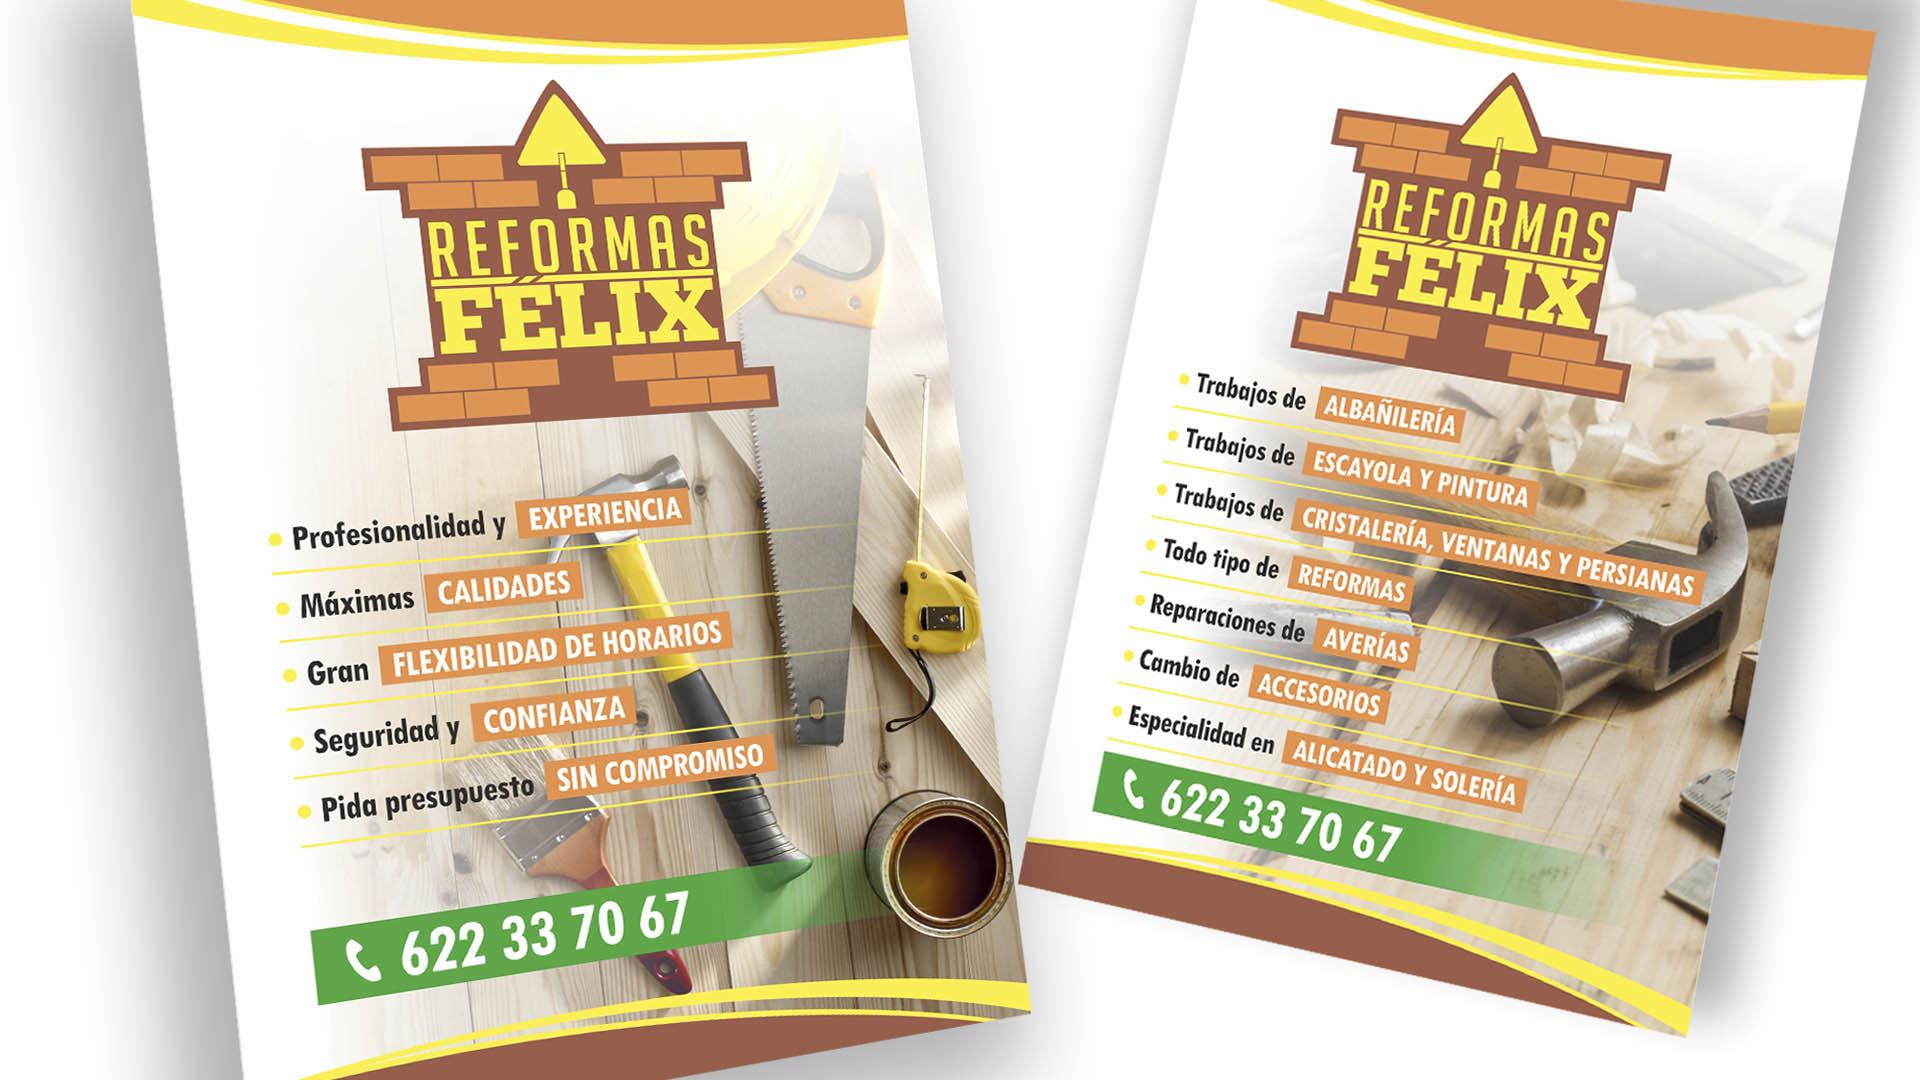 Reformas Félix